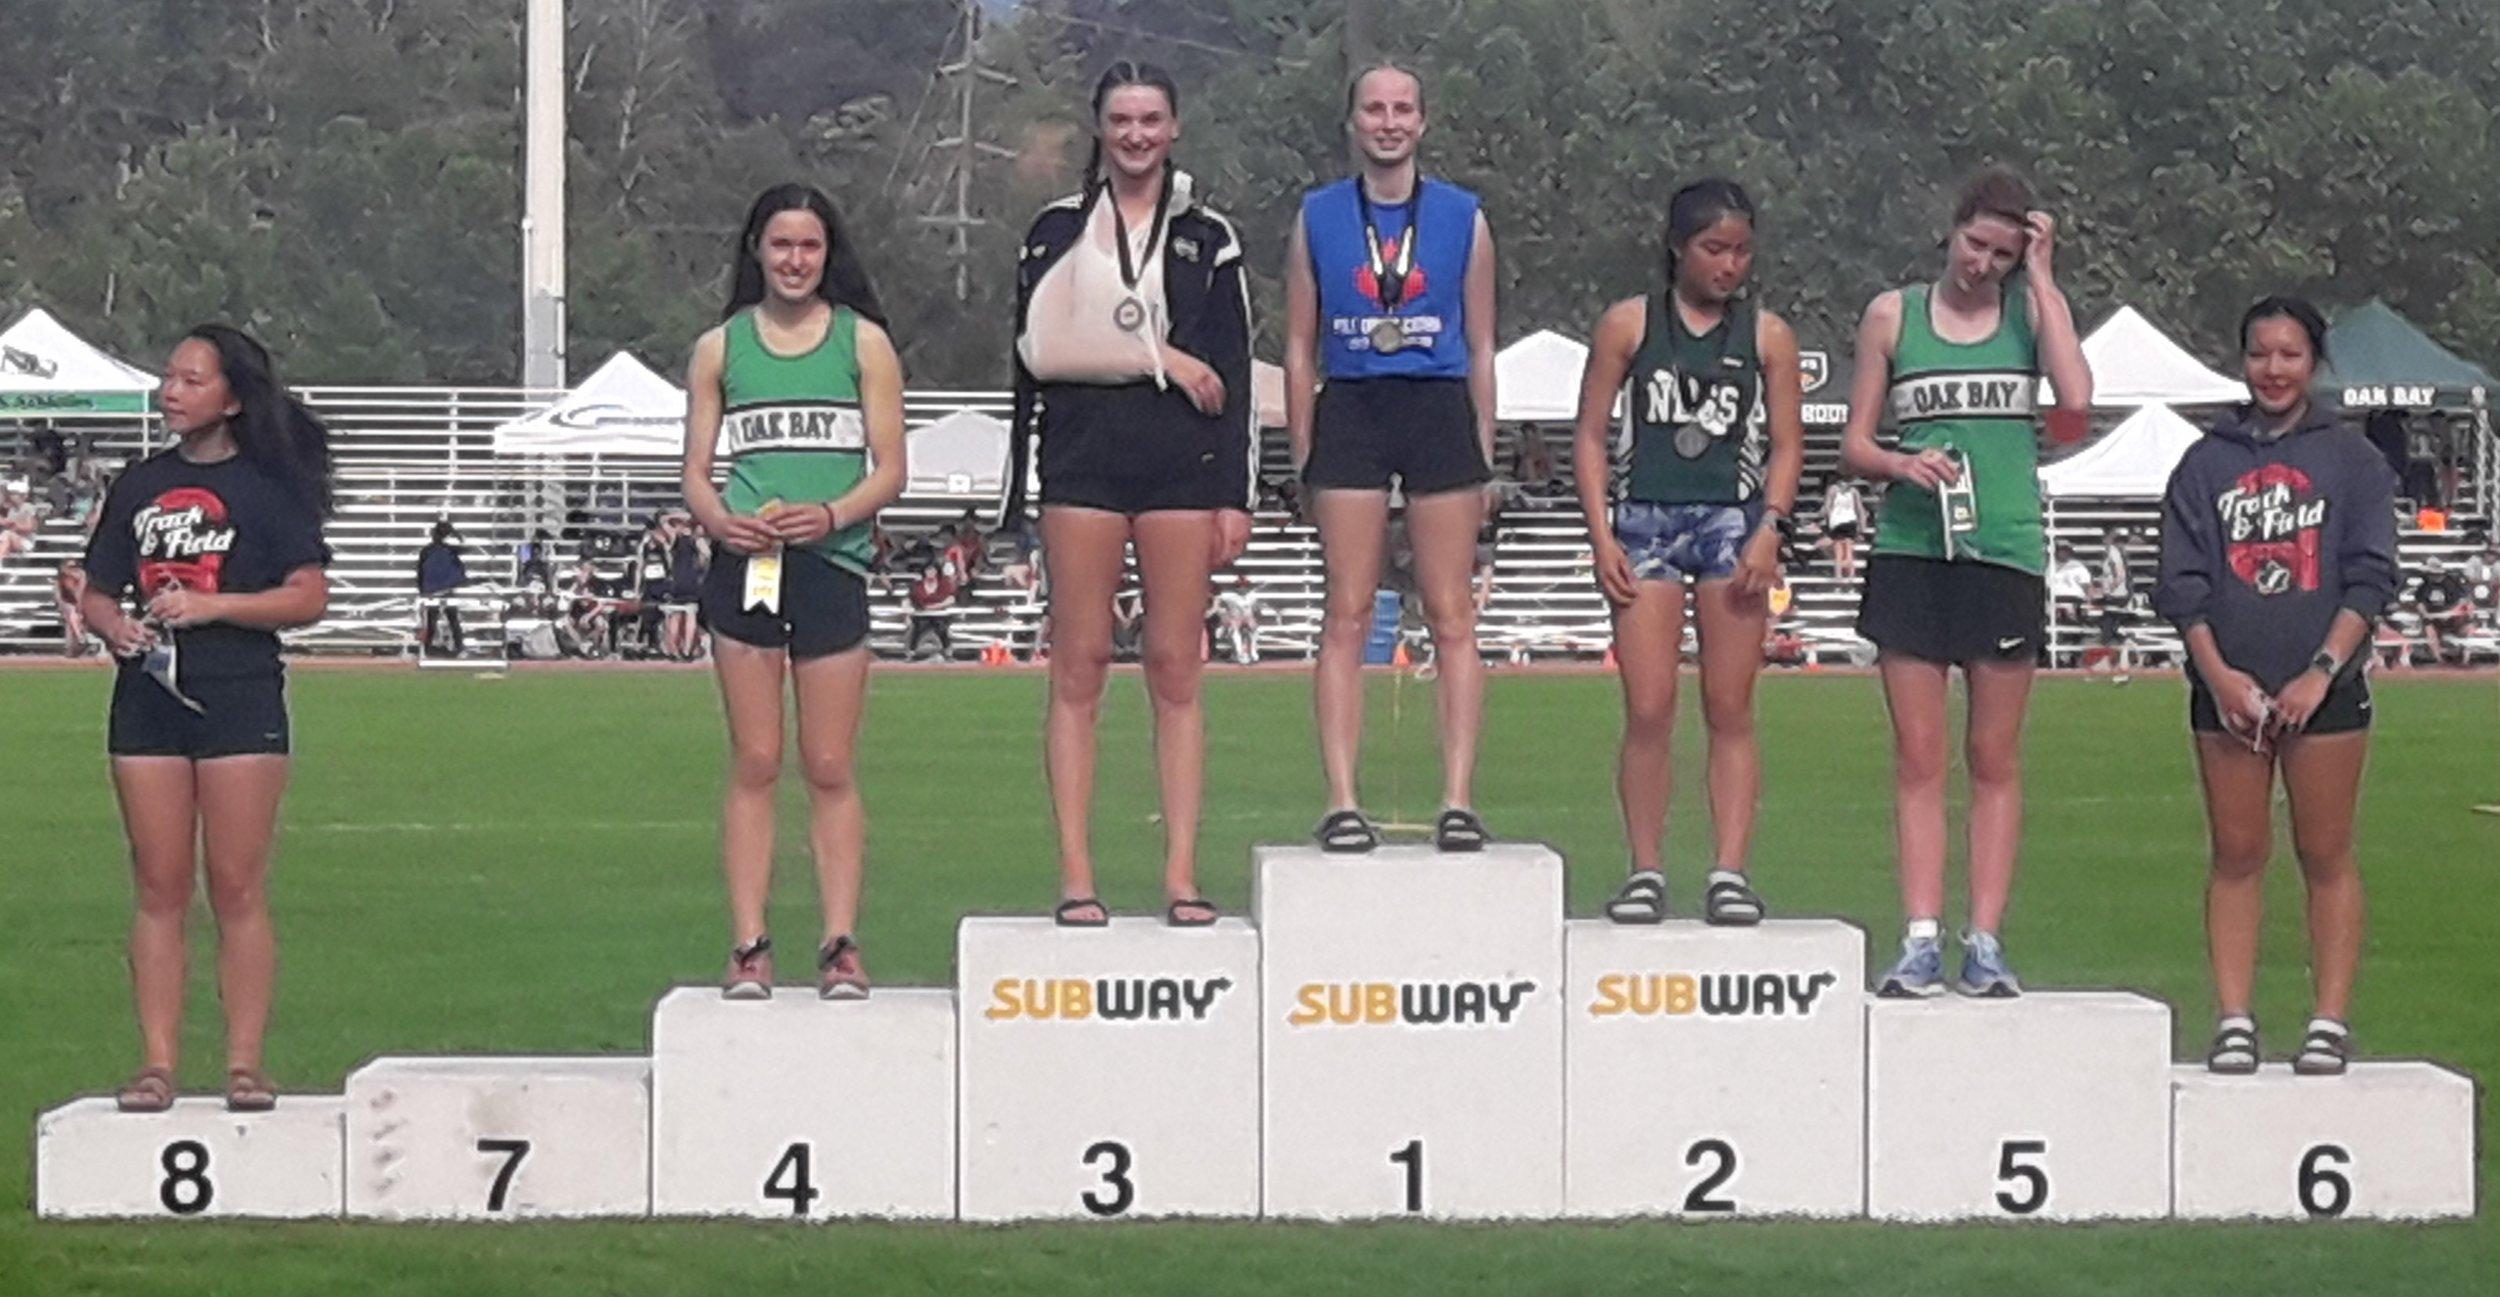 2019 BCHS Olivia, Macey podium.jpg